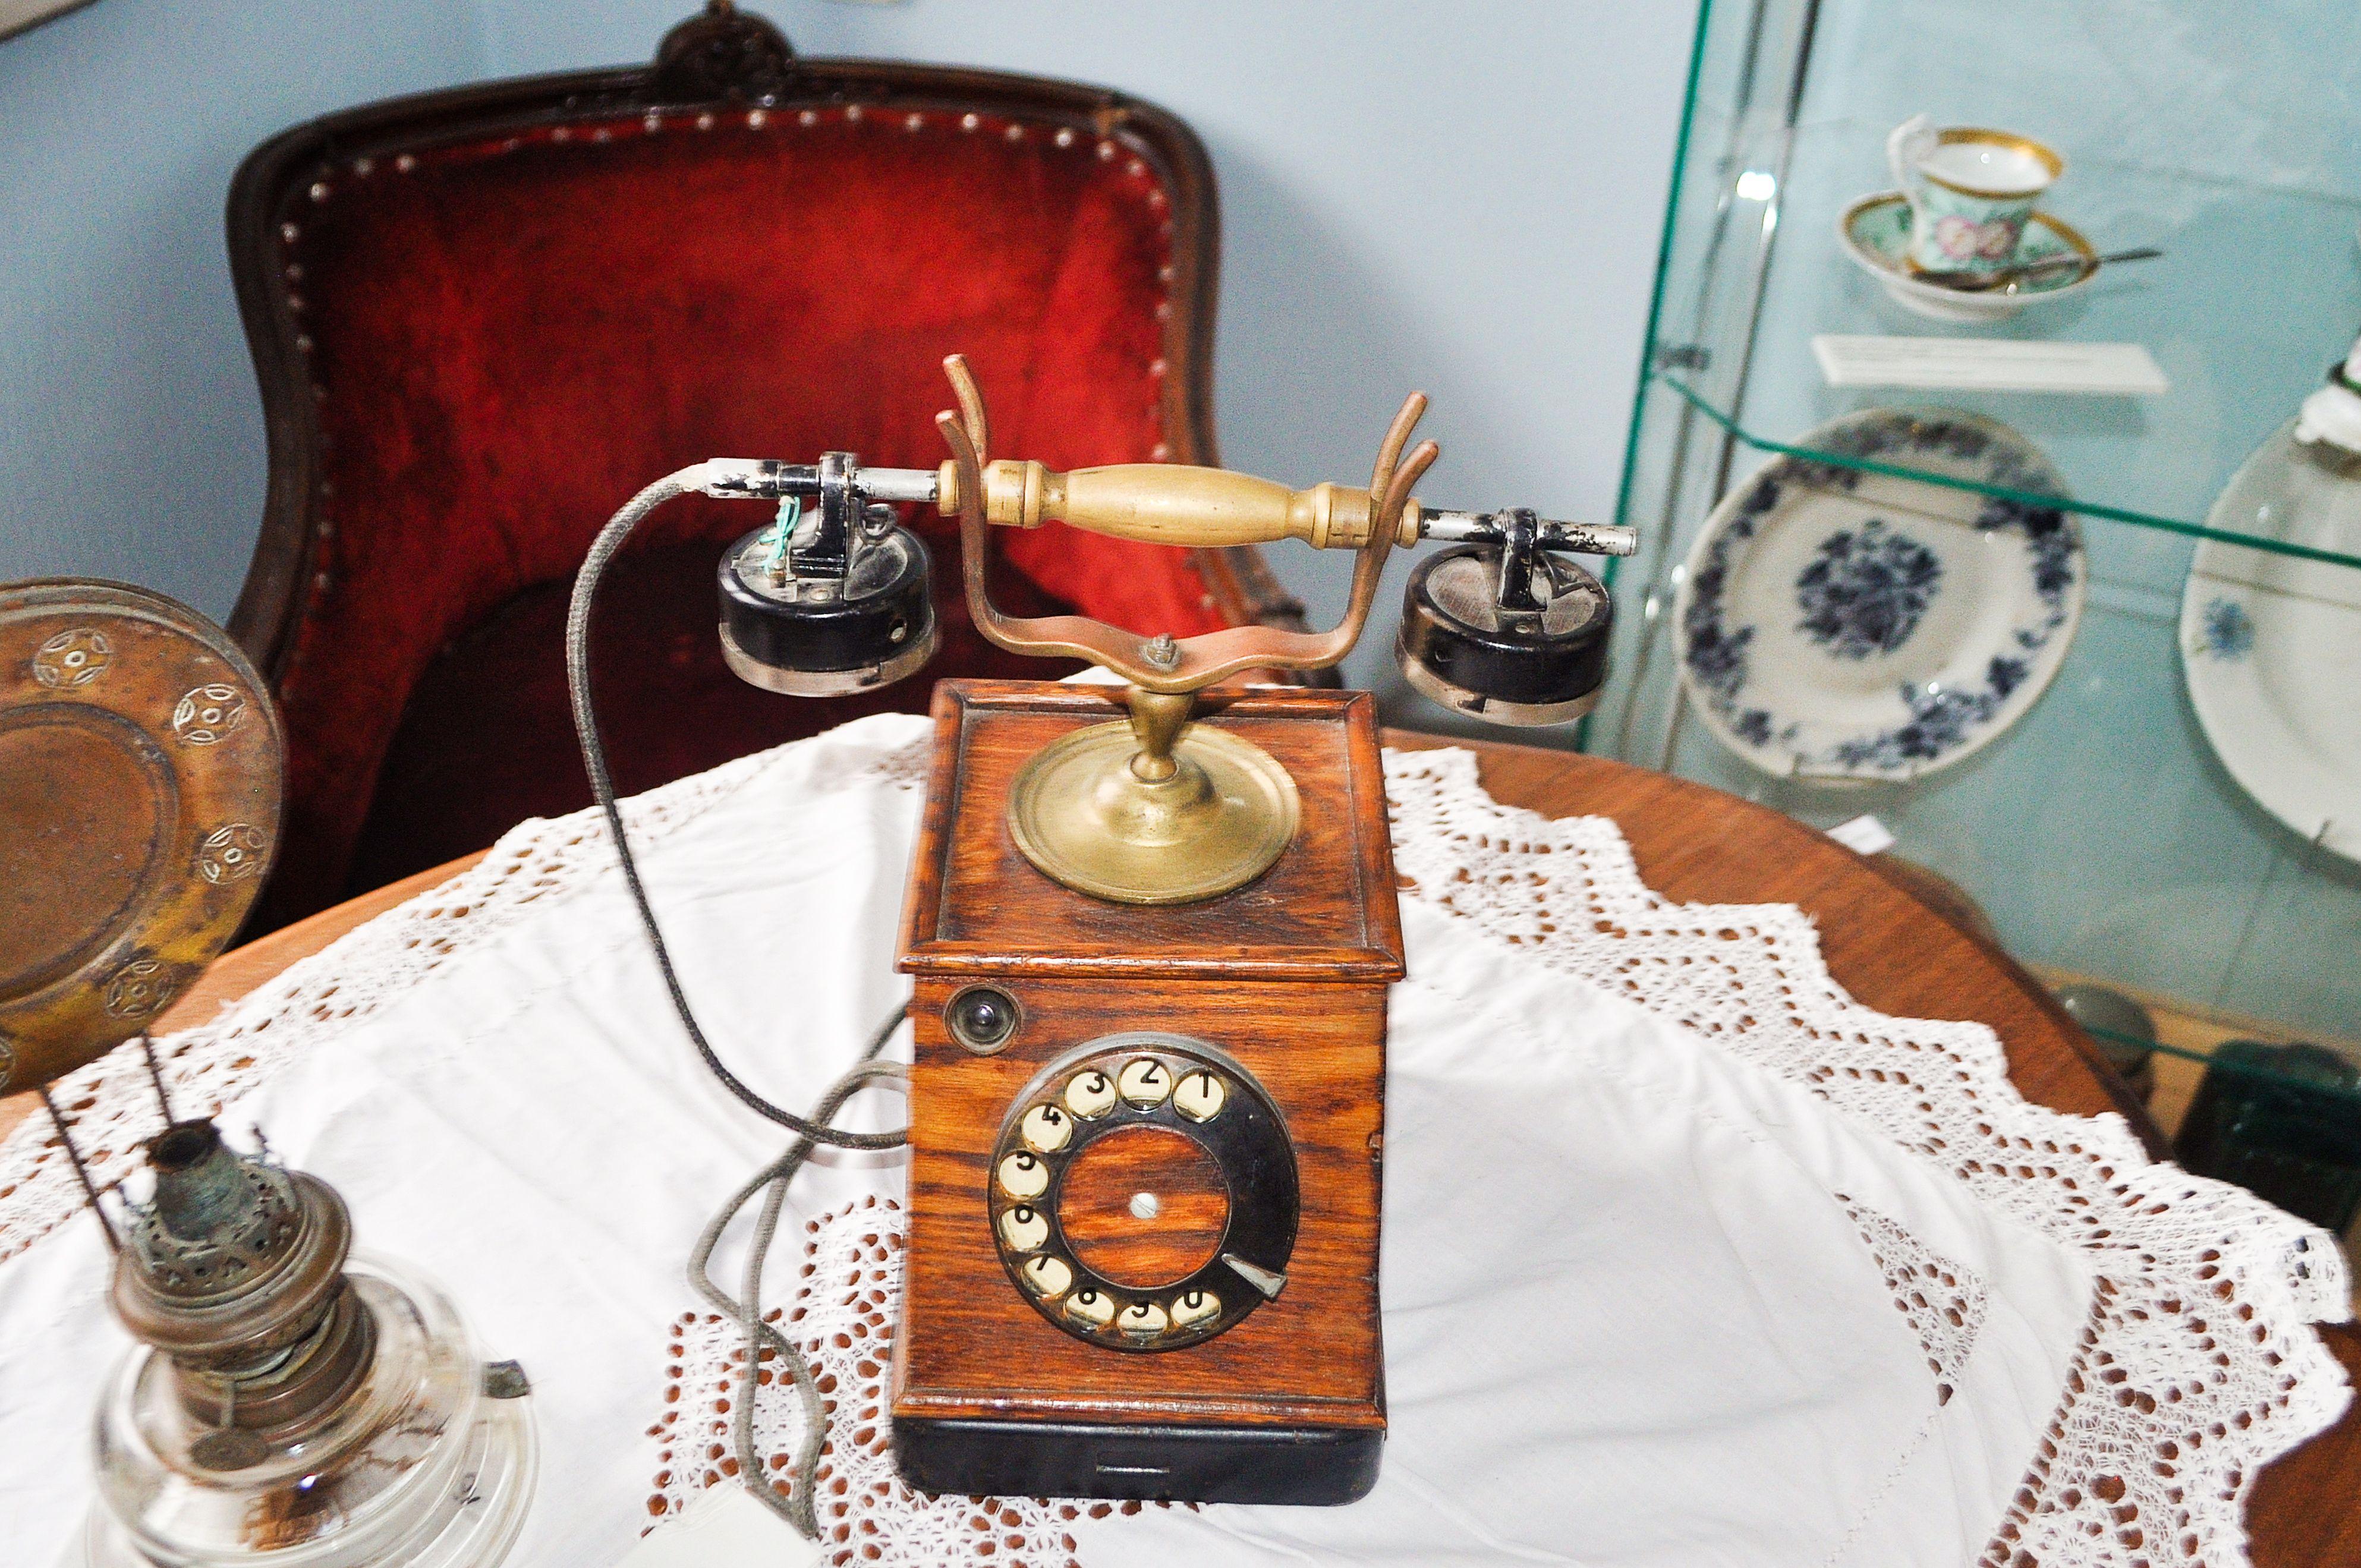 Рекорд посещаемости установили в музее Щаповского